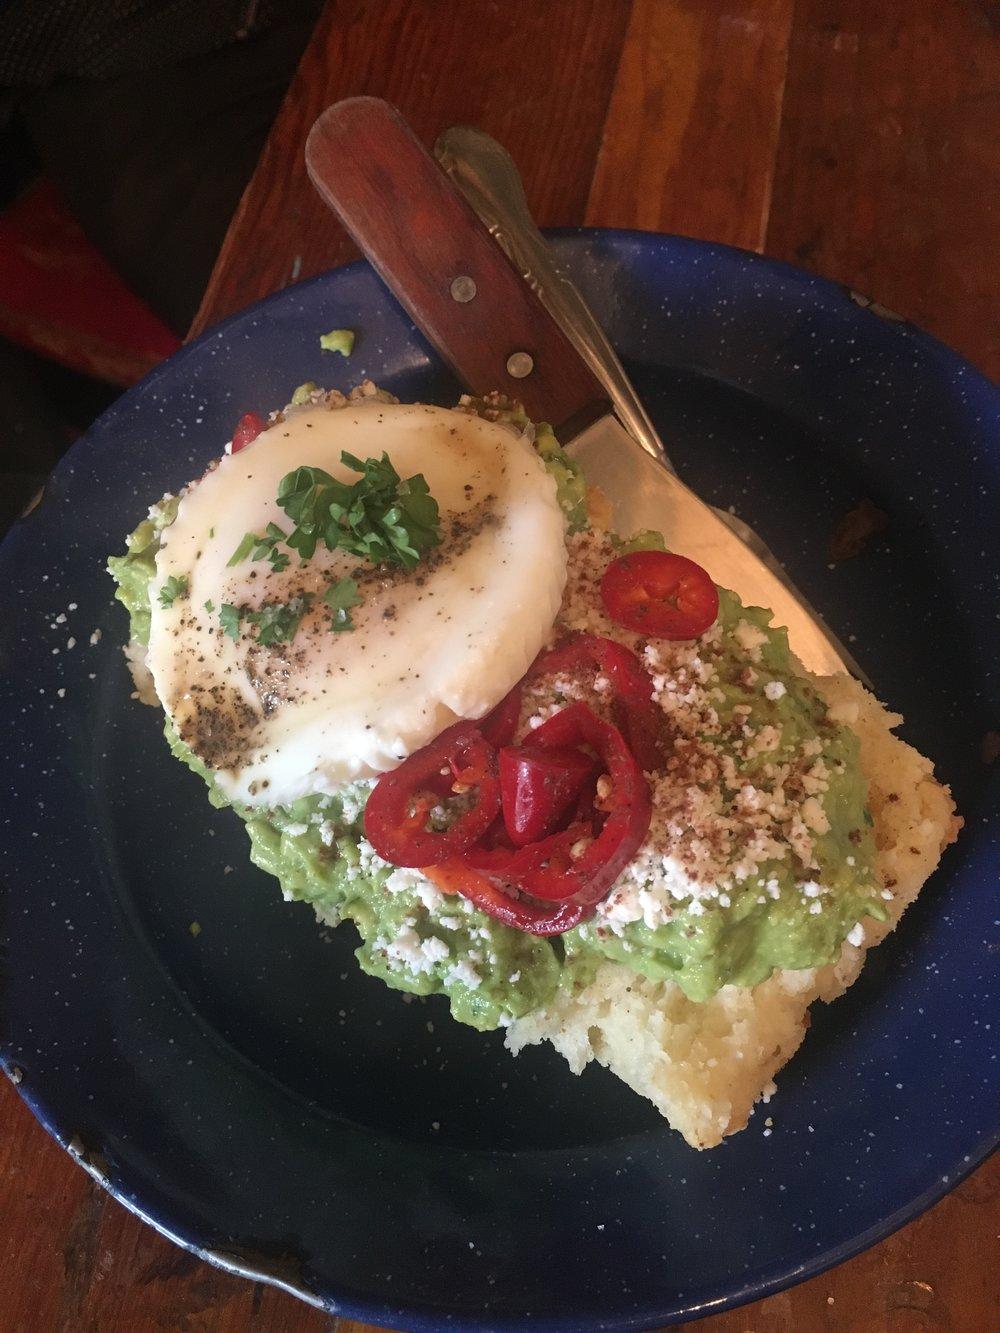 Avocado, fresno chiles, queso fresco, mole spice, cilantro